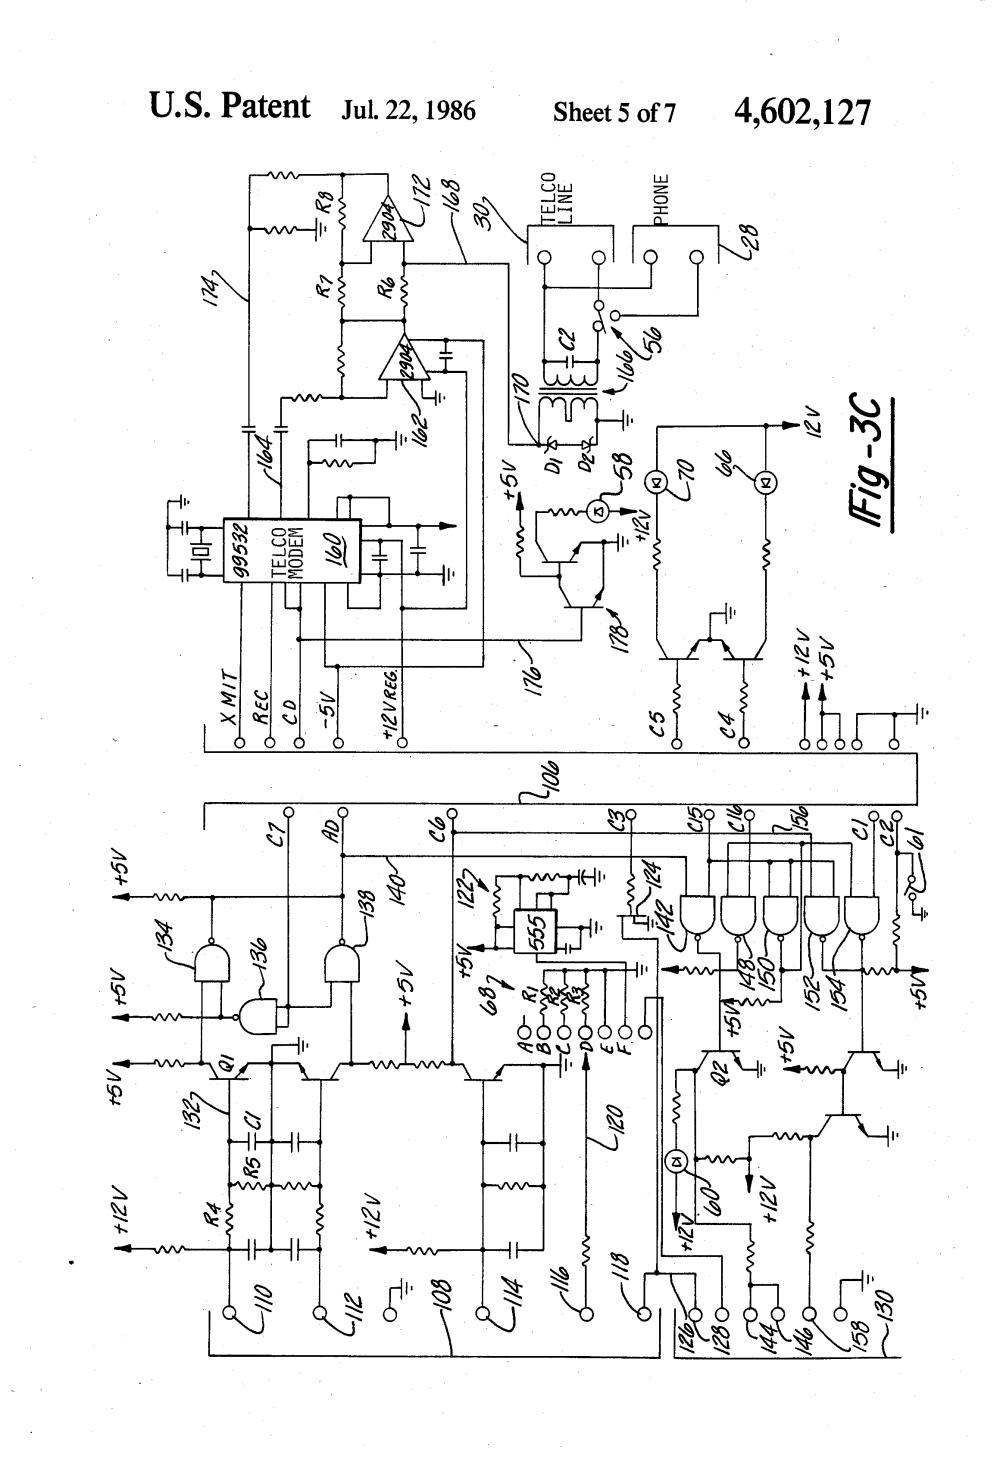 medium resolution of eberspacher d wiring diagram wiring diagram images wiring us4602127 5 patent us4602127 diagnostic data recorder google